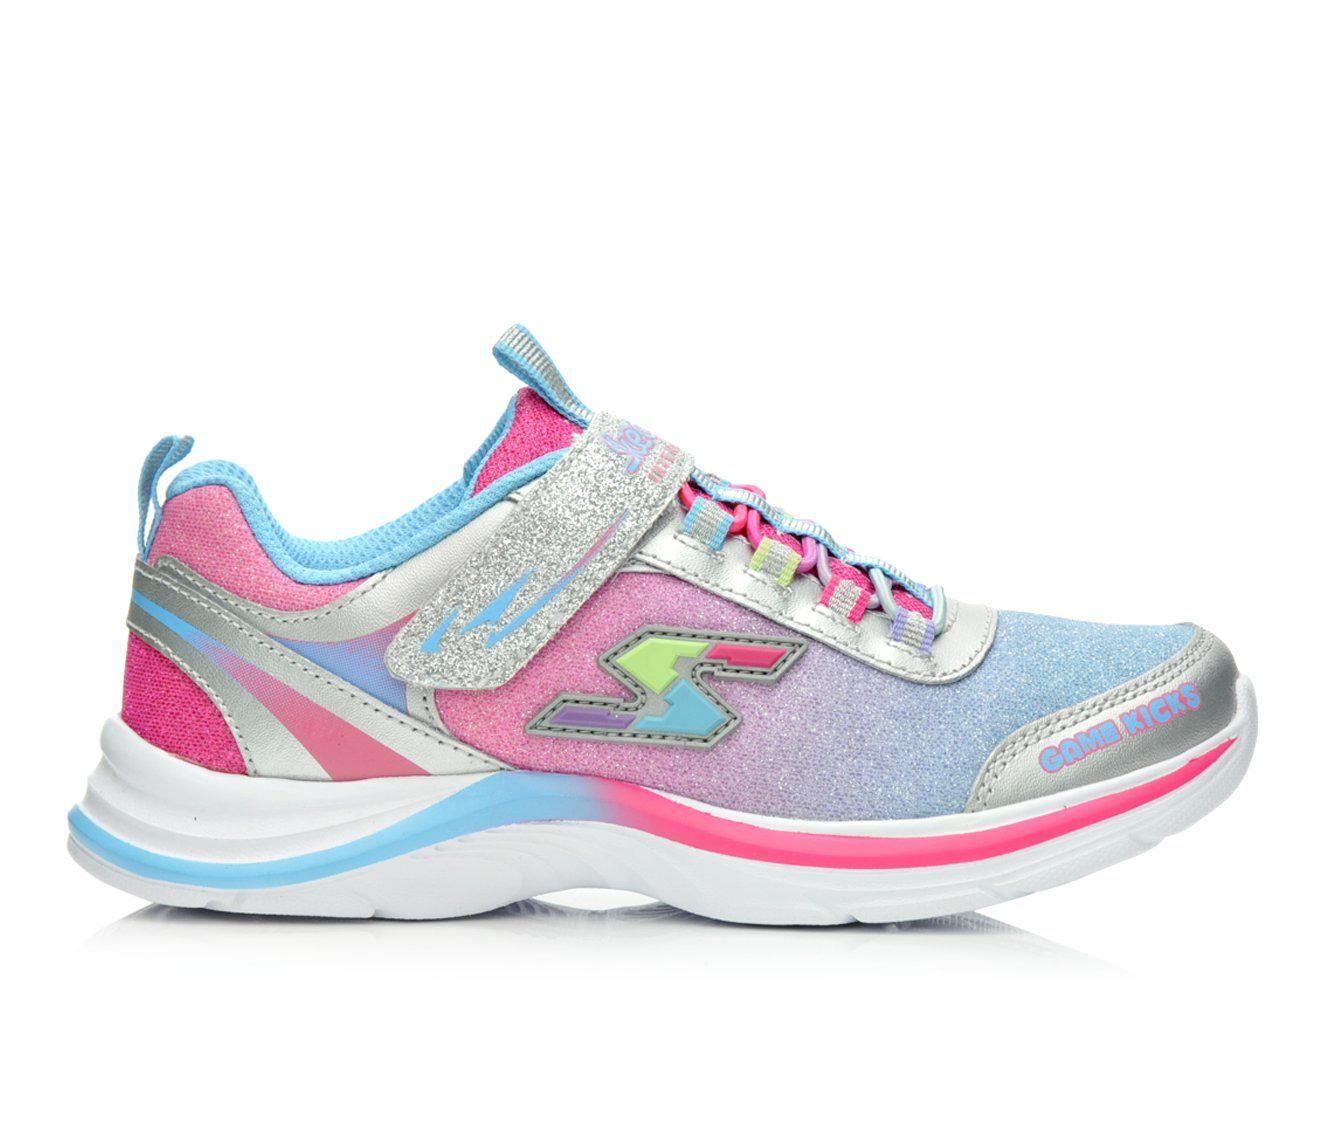 Girls' Skechers Swift Game Kicks- Super Skills Sneakers (Multicolor)